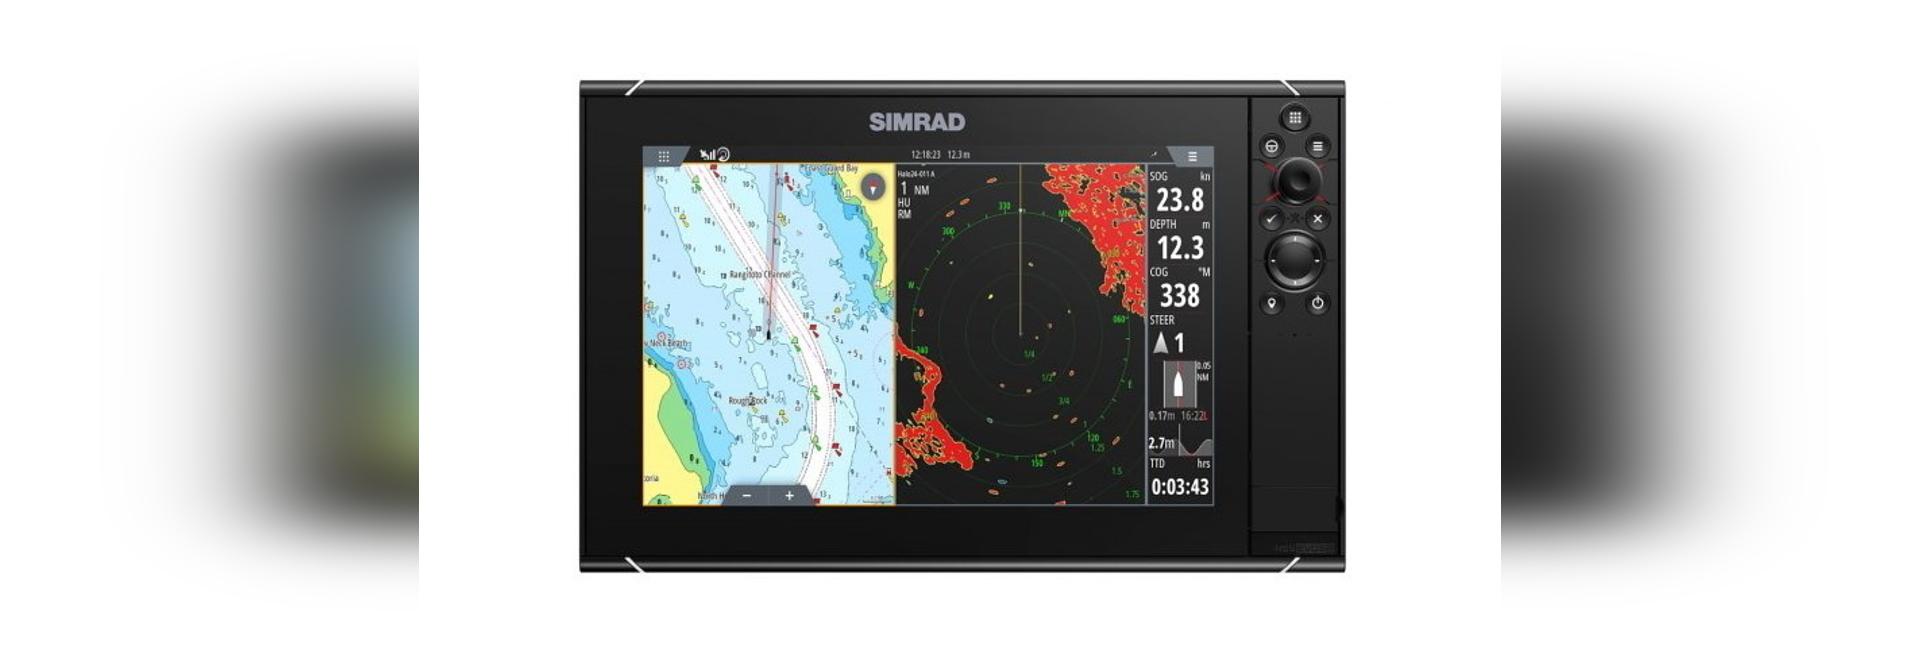 Meet the new Simrad NSSevo3s: The best just got better